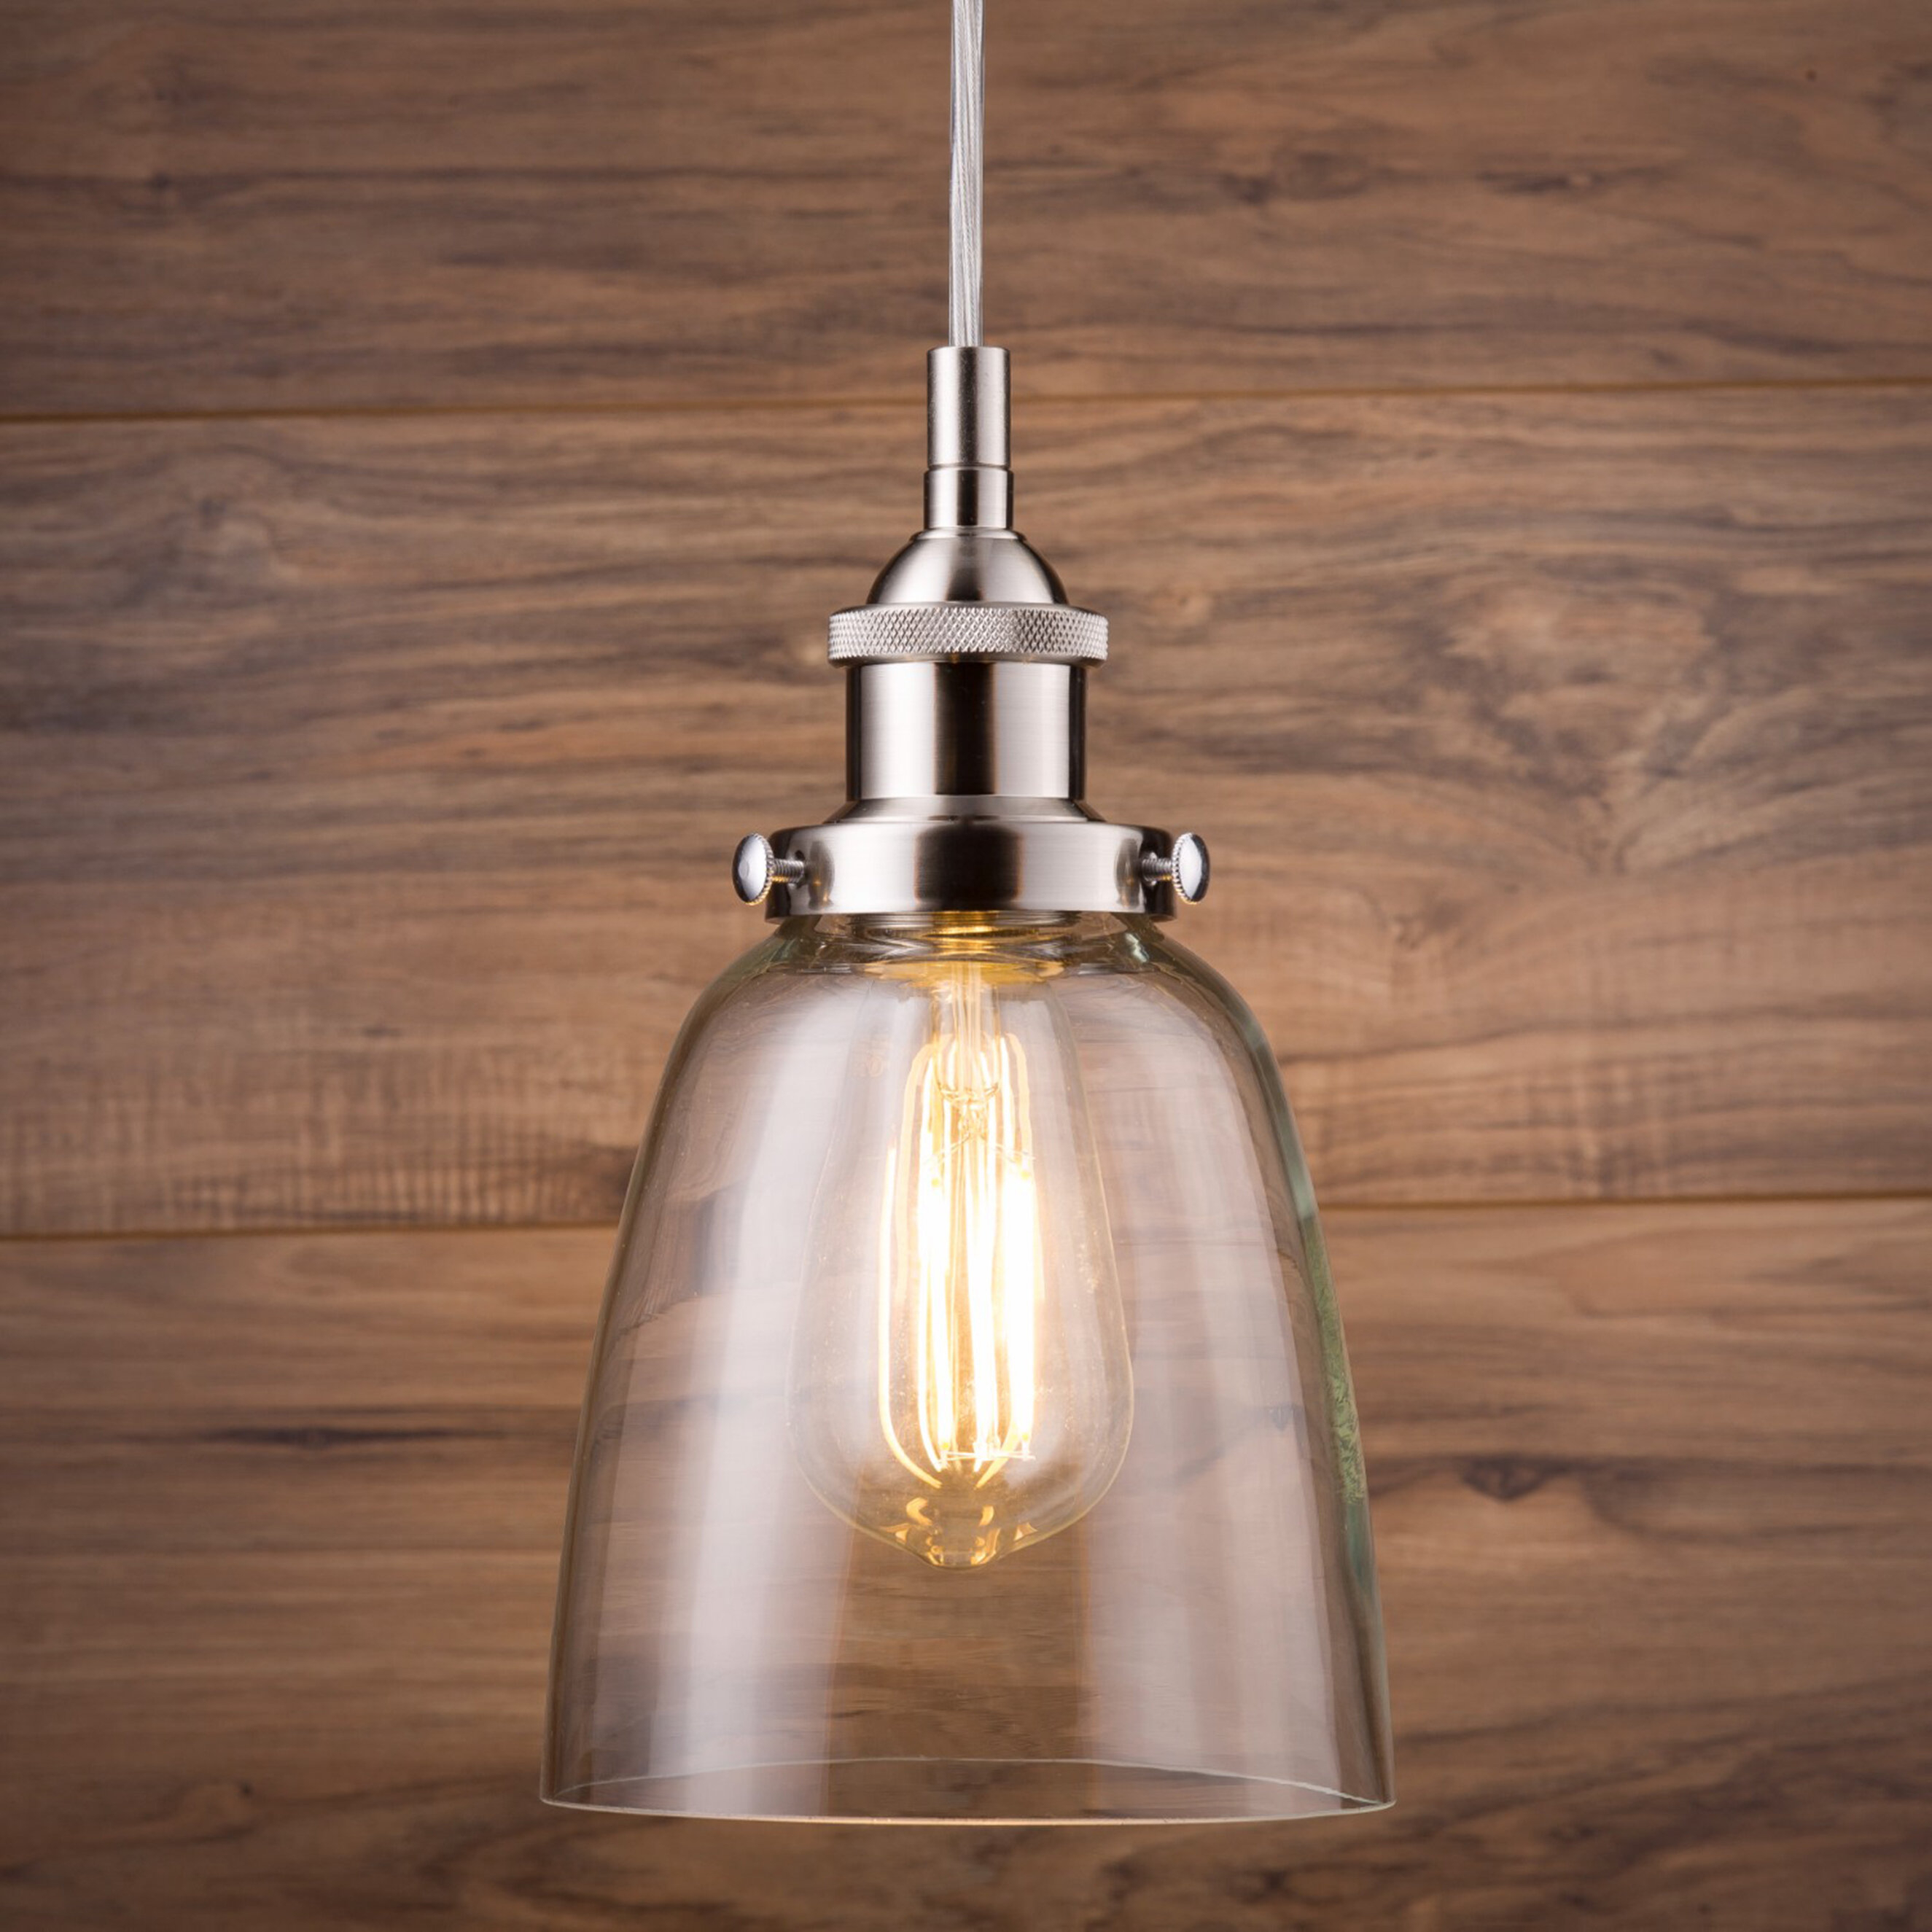 Bundaberg 1 Light Single Bell Pendant Regarding Scruggs 1 Light Geometric Pendants (View 4 of 30)